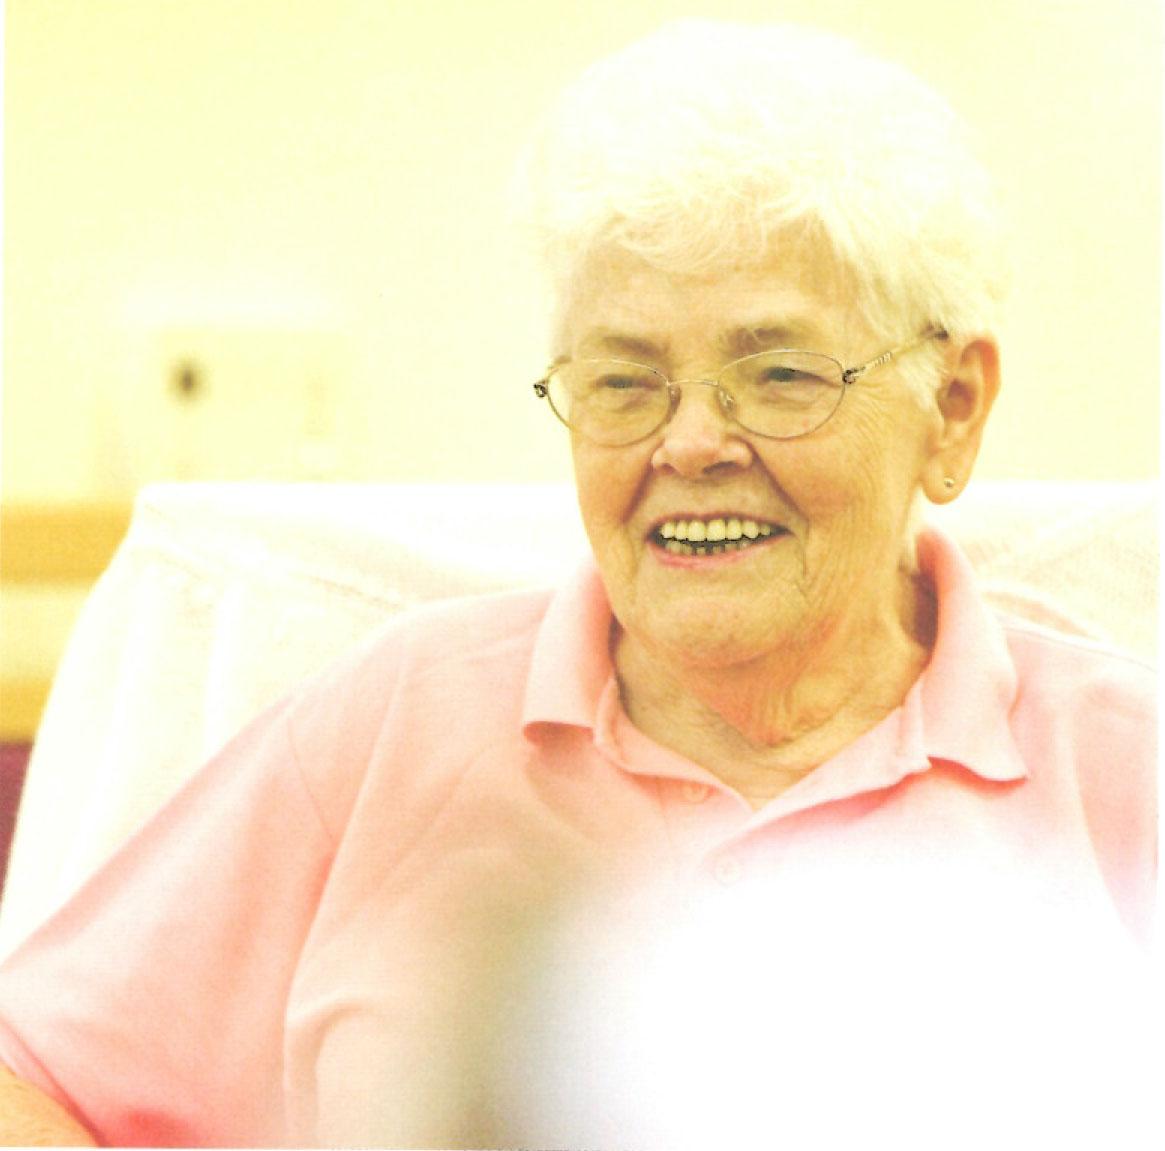 Smiling granny.jpg